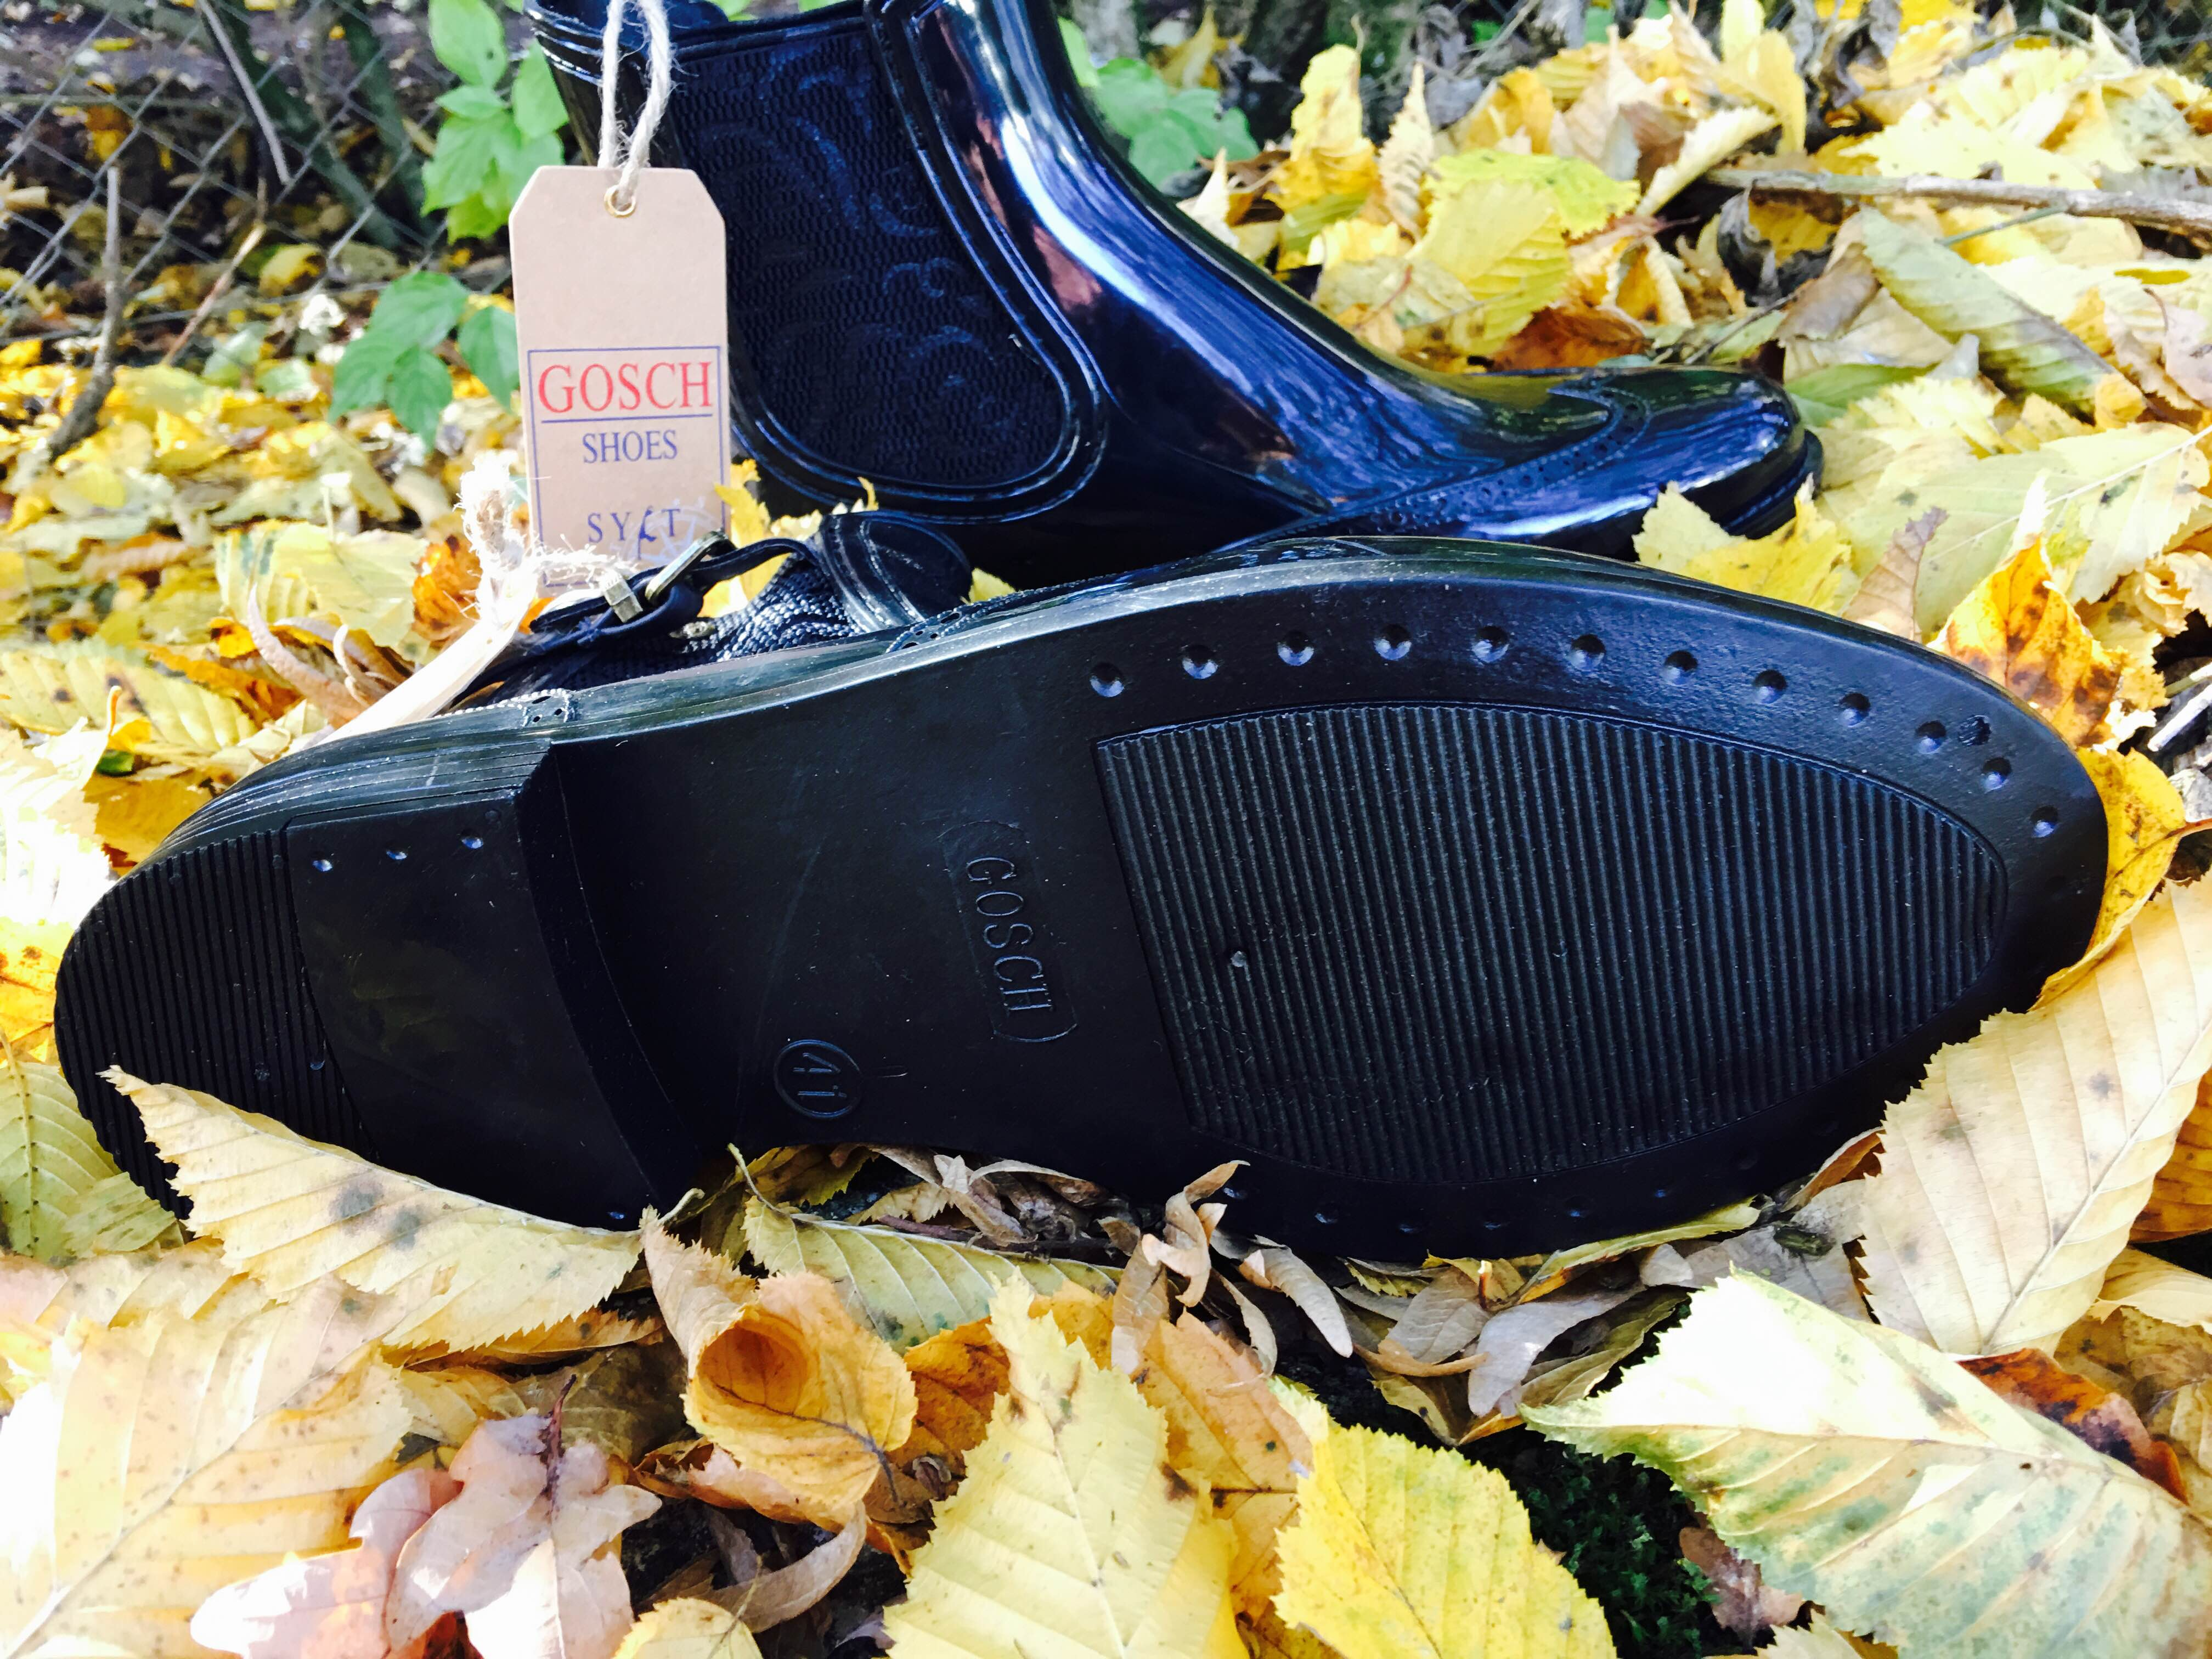 Gosch Shoes Sylt Sohle